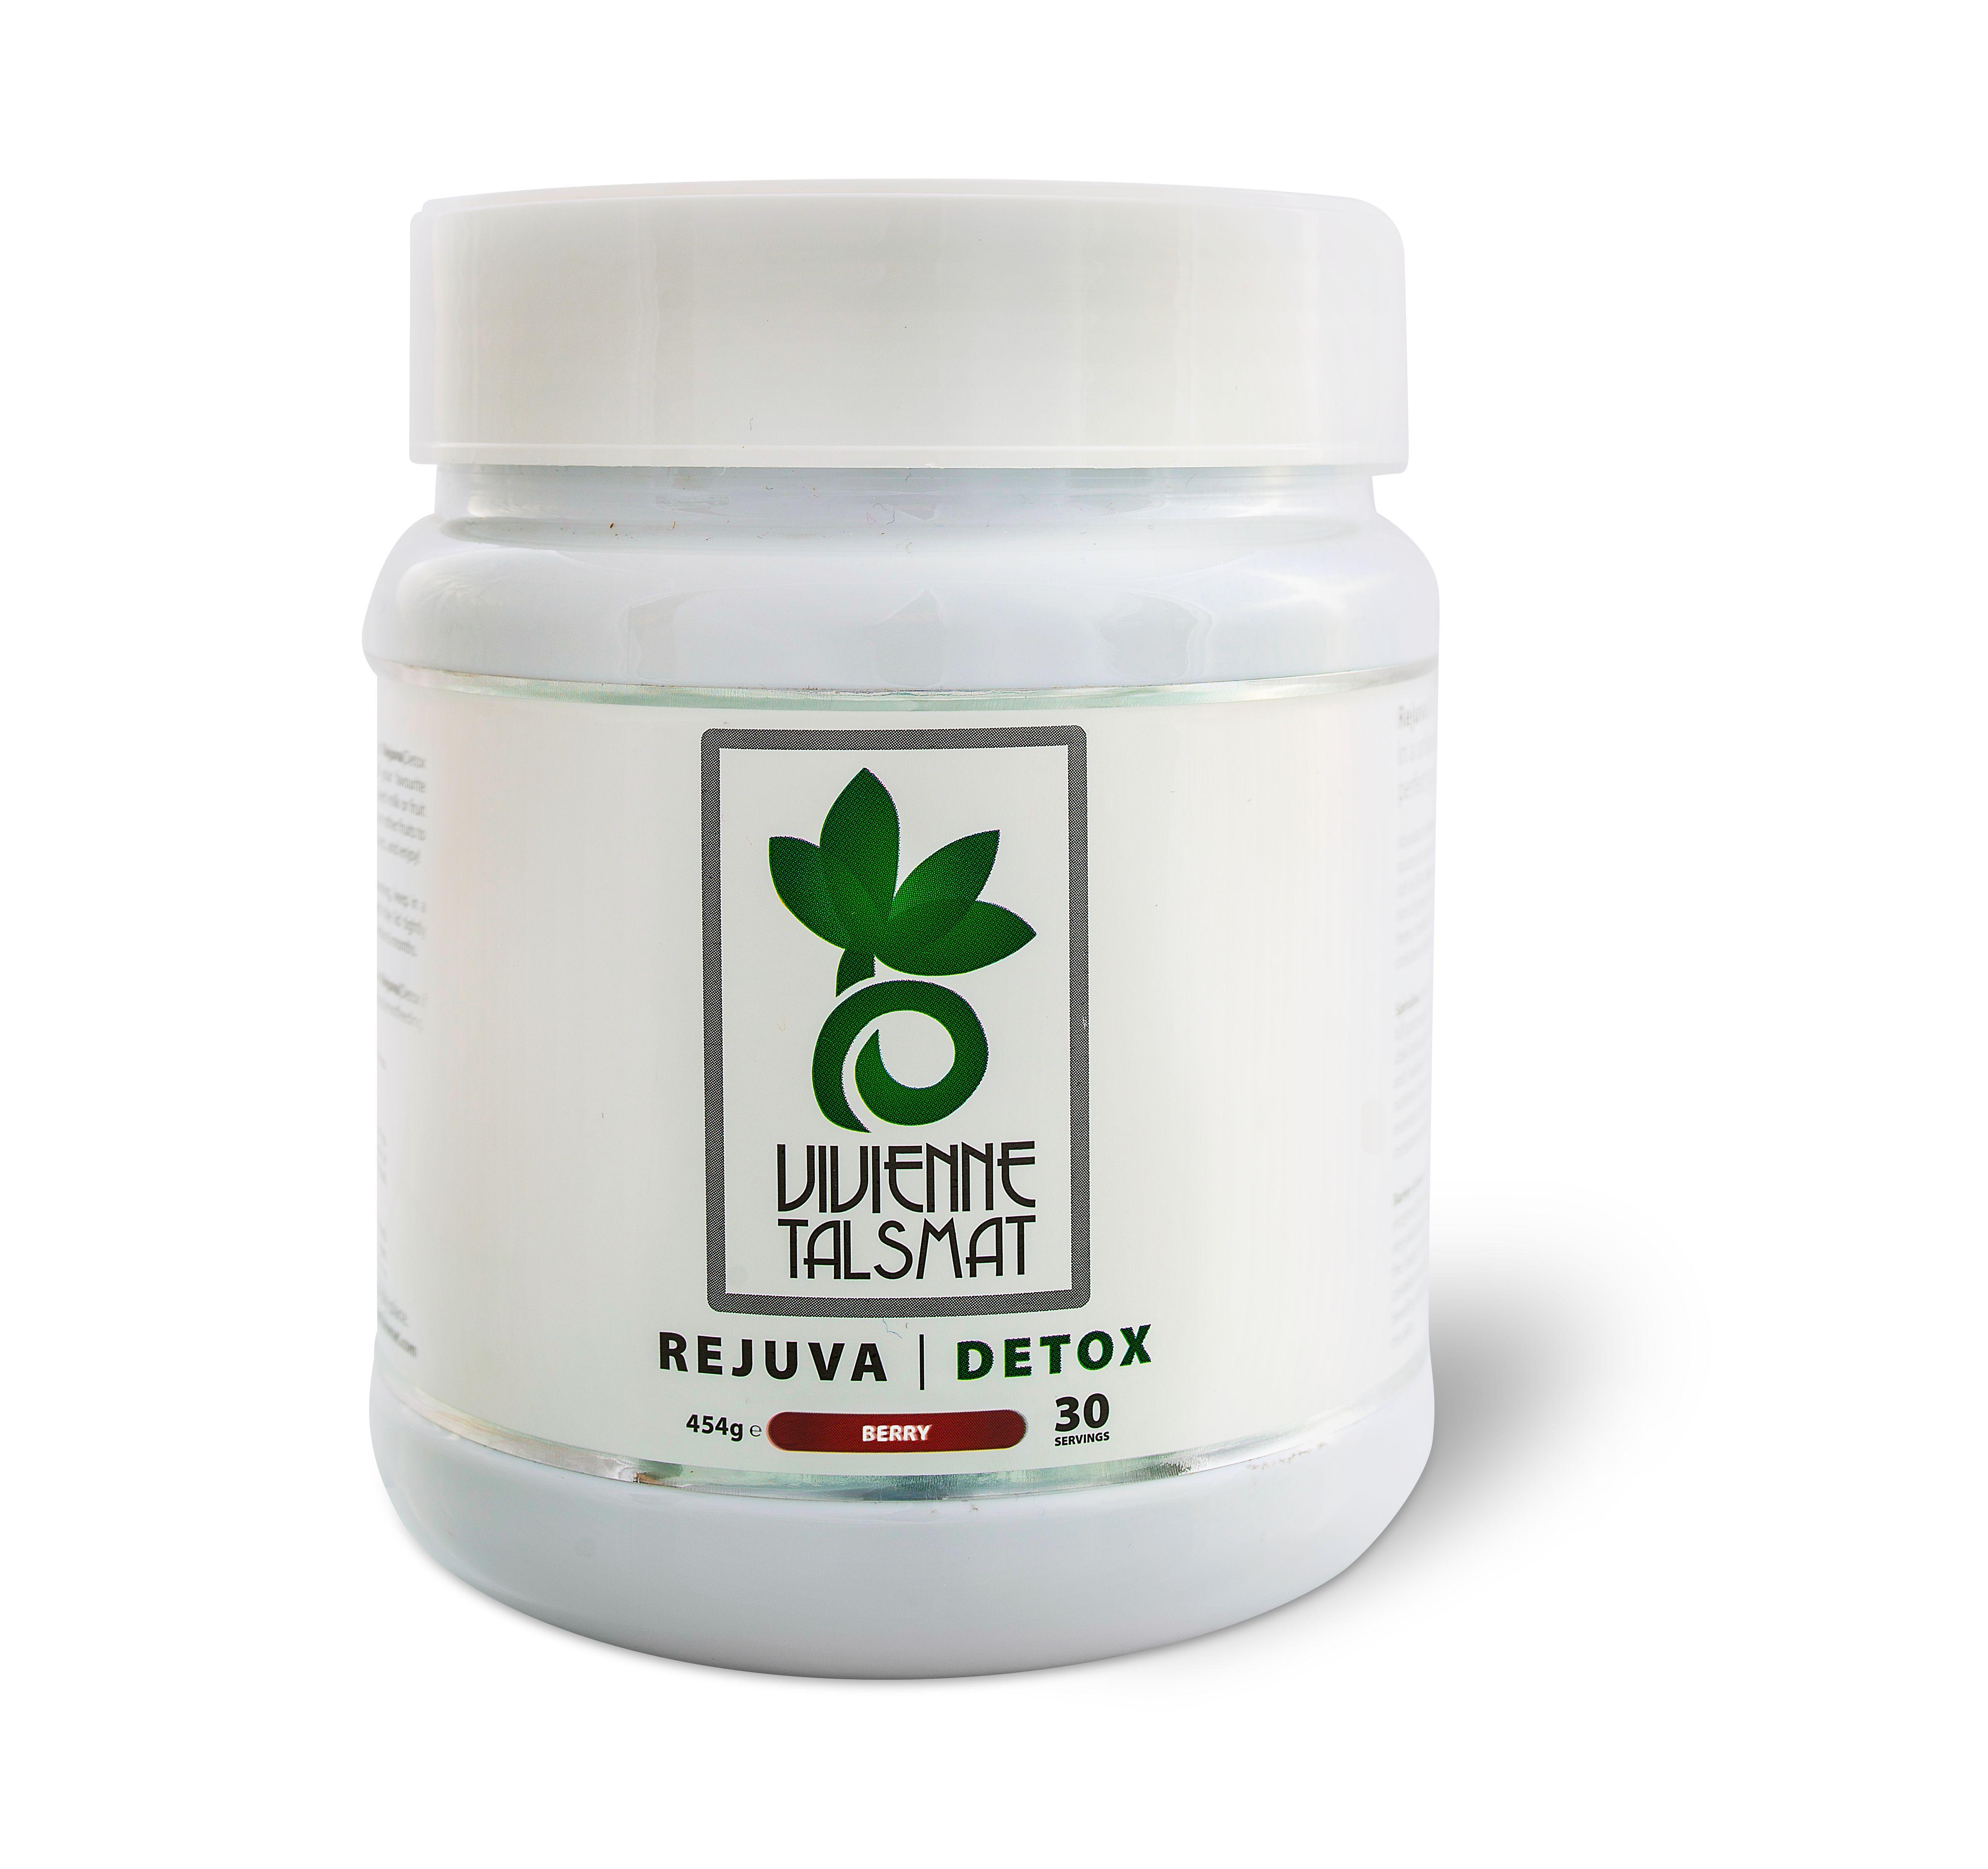 Vivienne Talsmat Rejuva Detox Berry 454 g